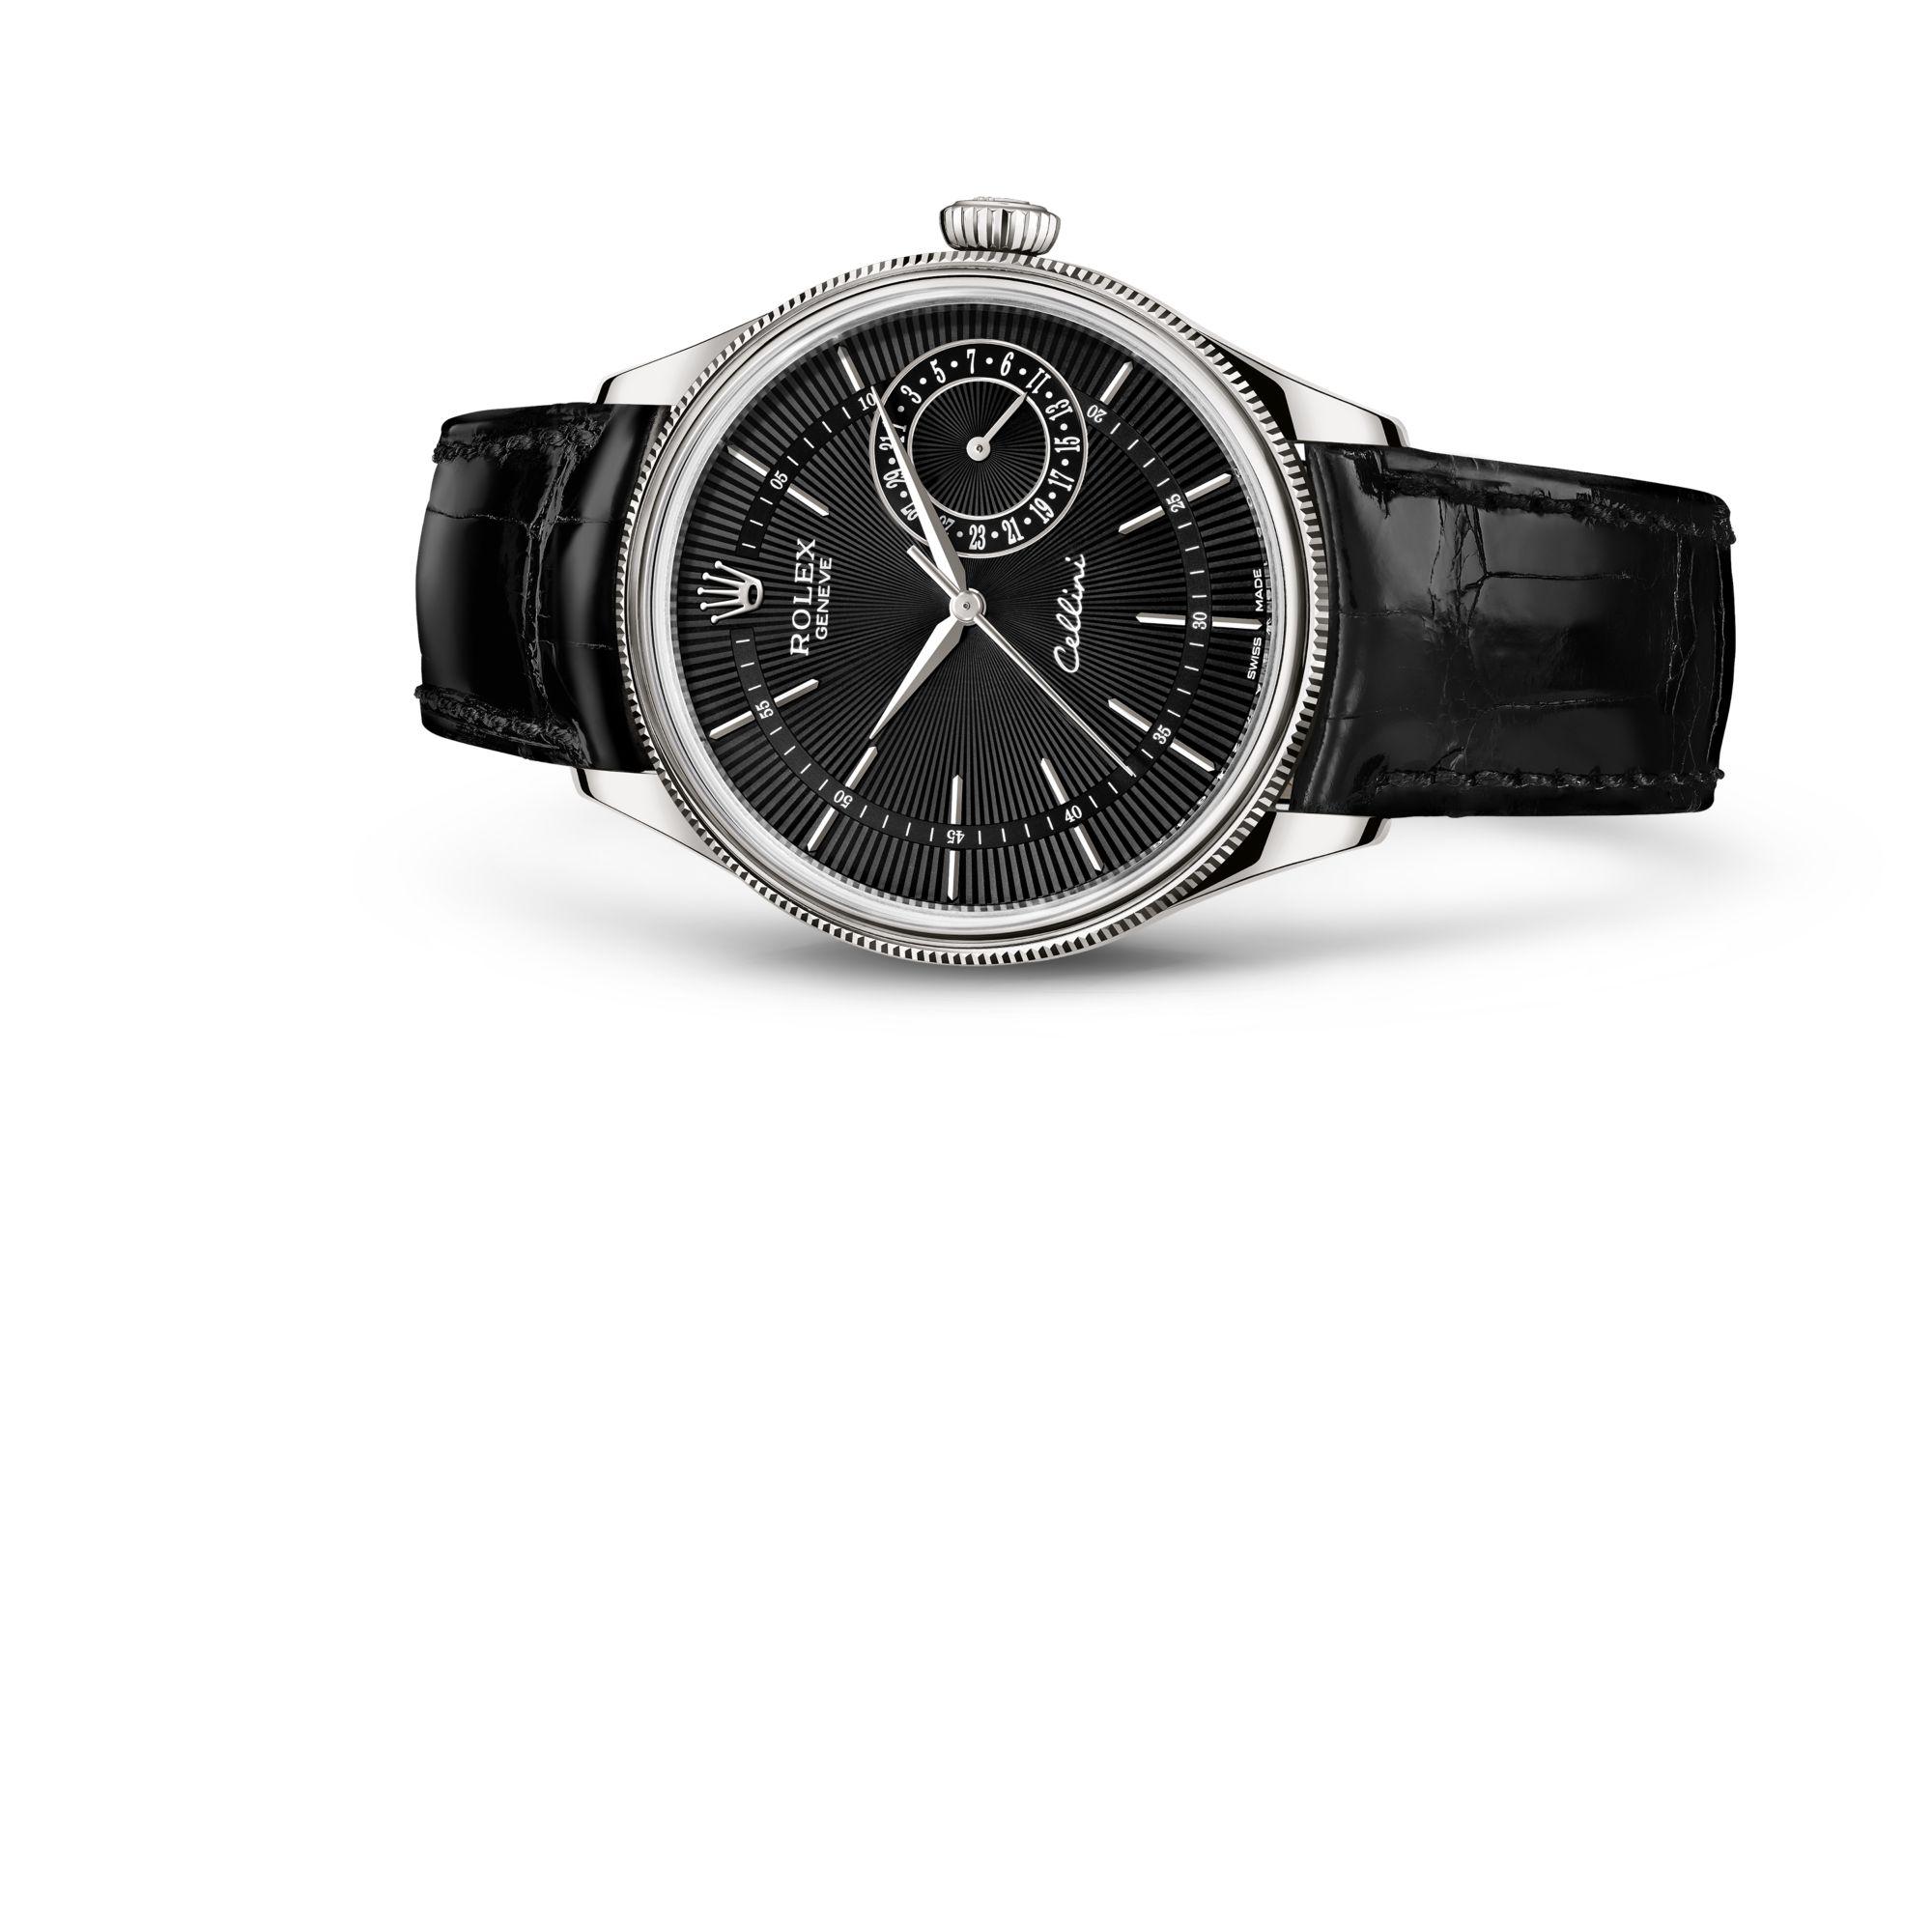 Rolex تشيليني ديت M50519-0007